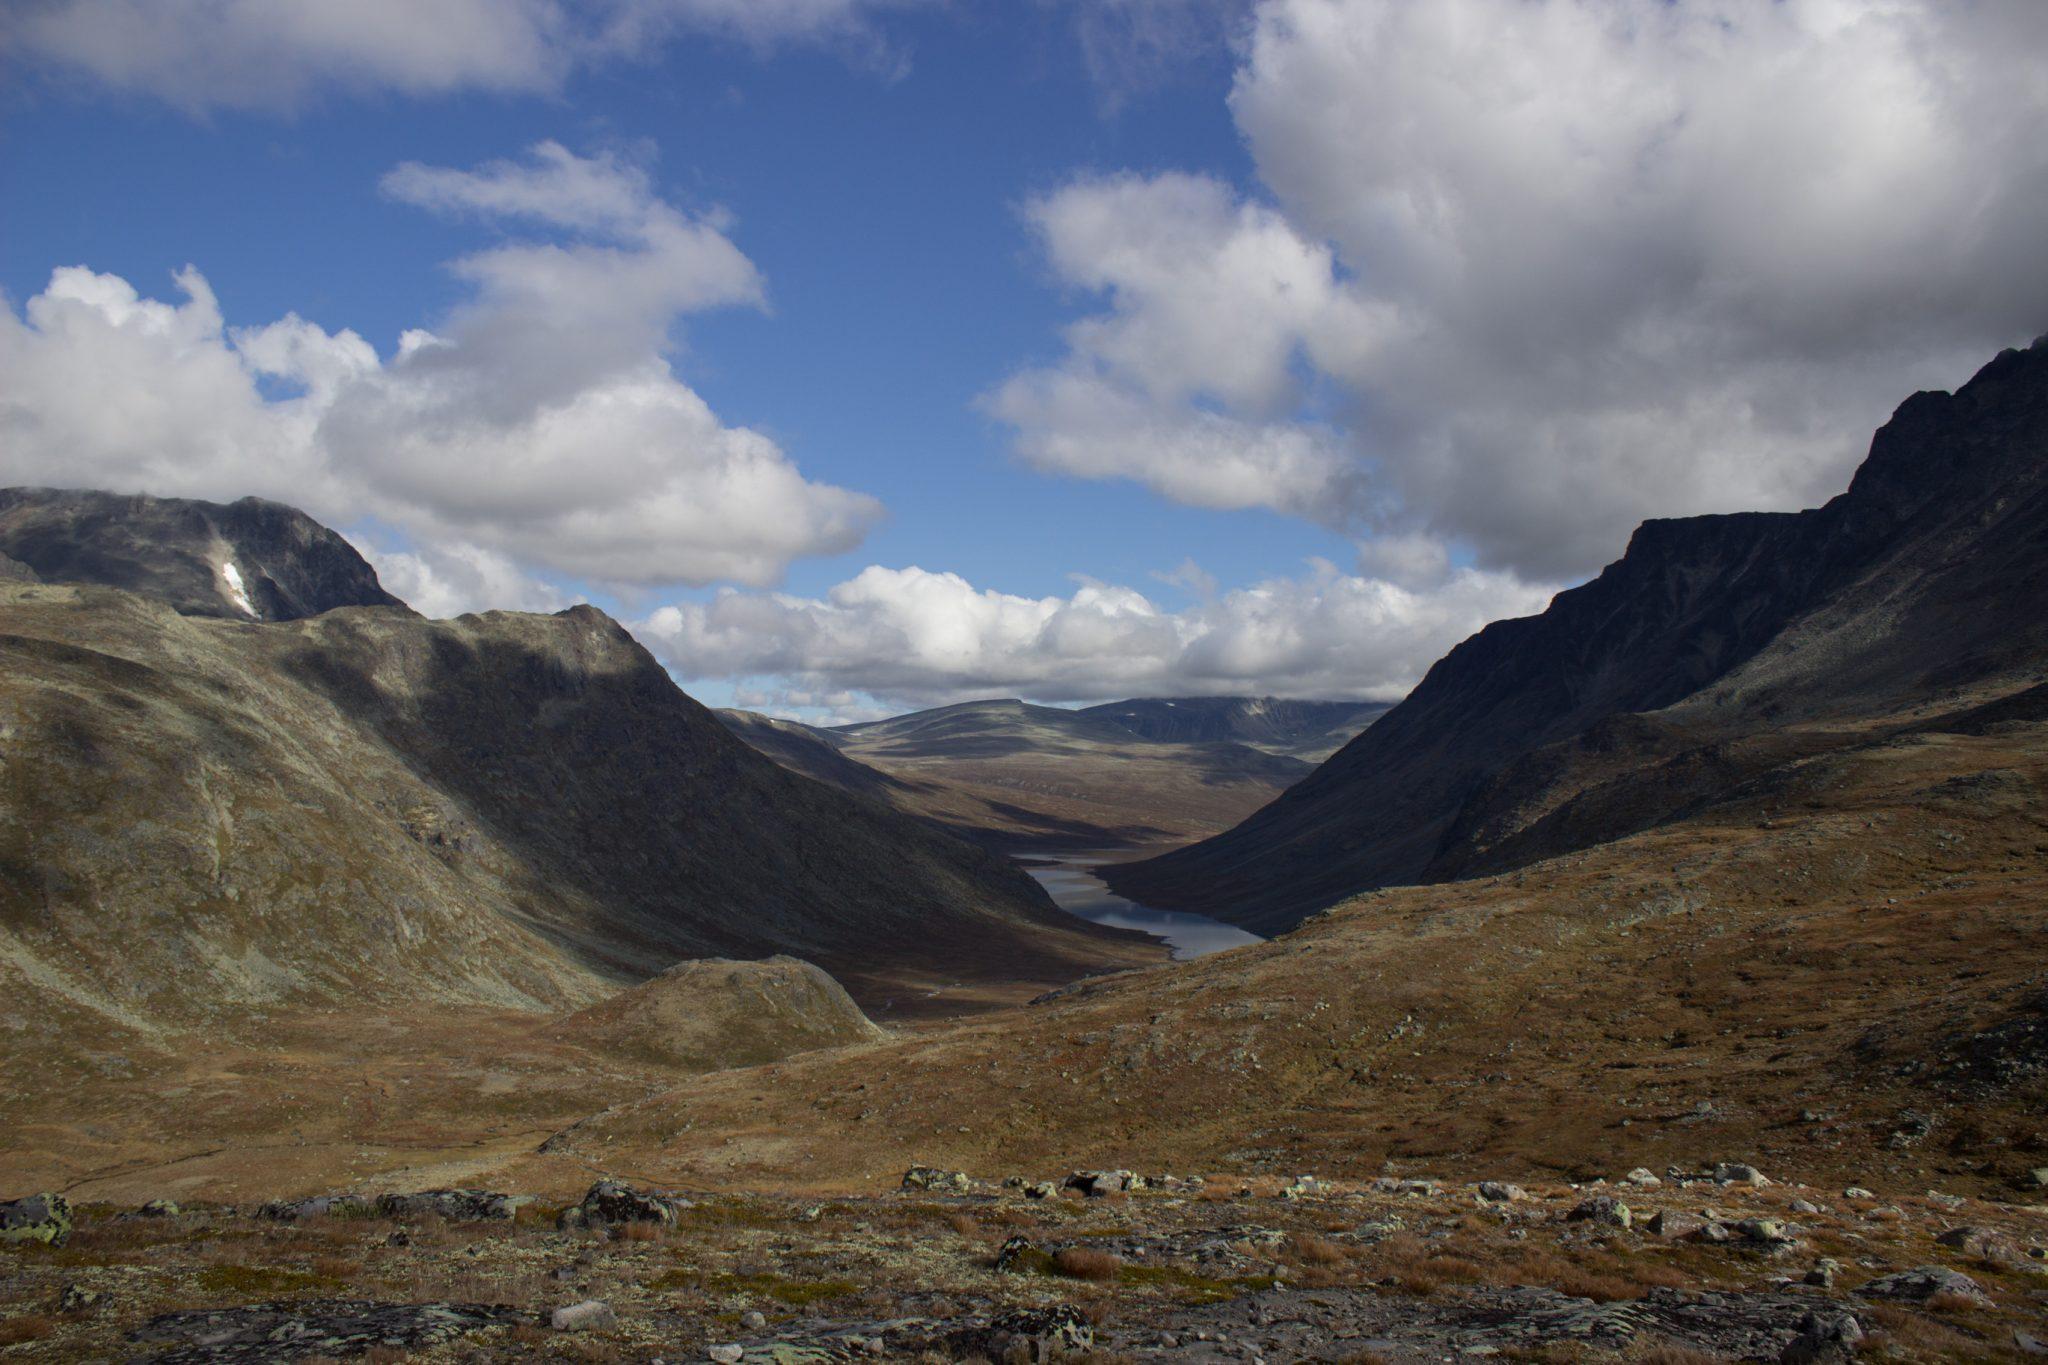 Wanderung Besseggen-Grat im Jotunheimen Nationalpark, traumhafte Landschaft, teils karg